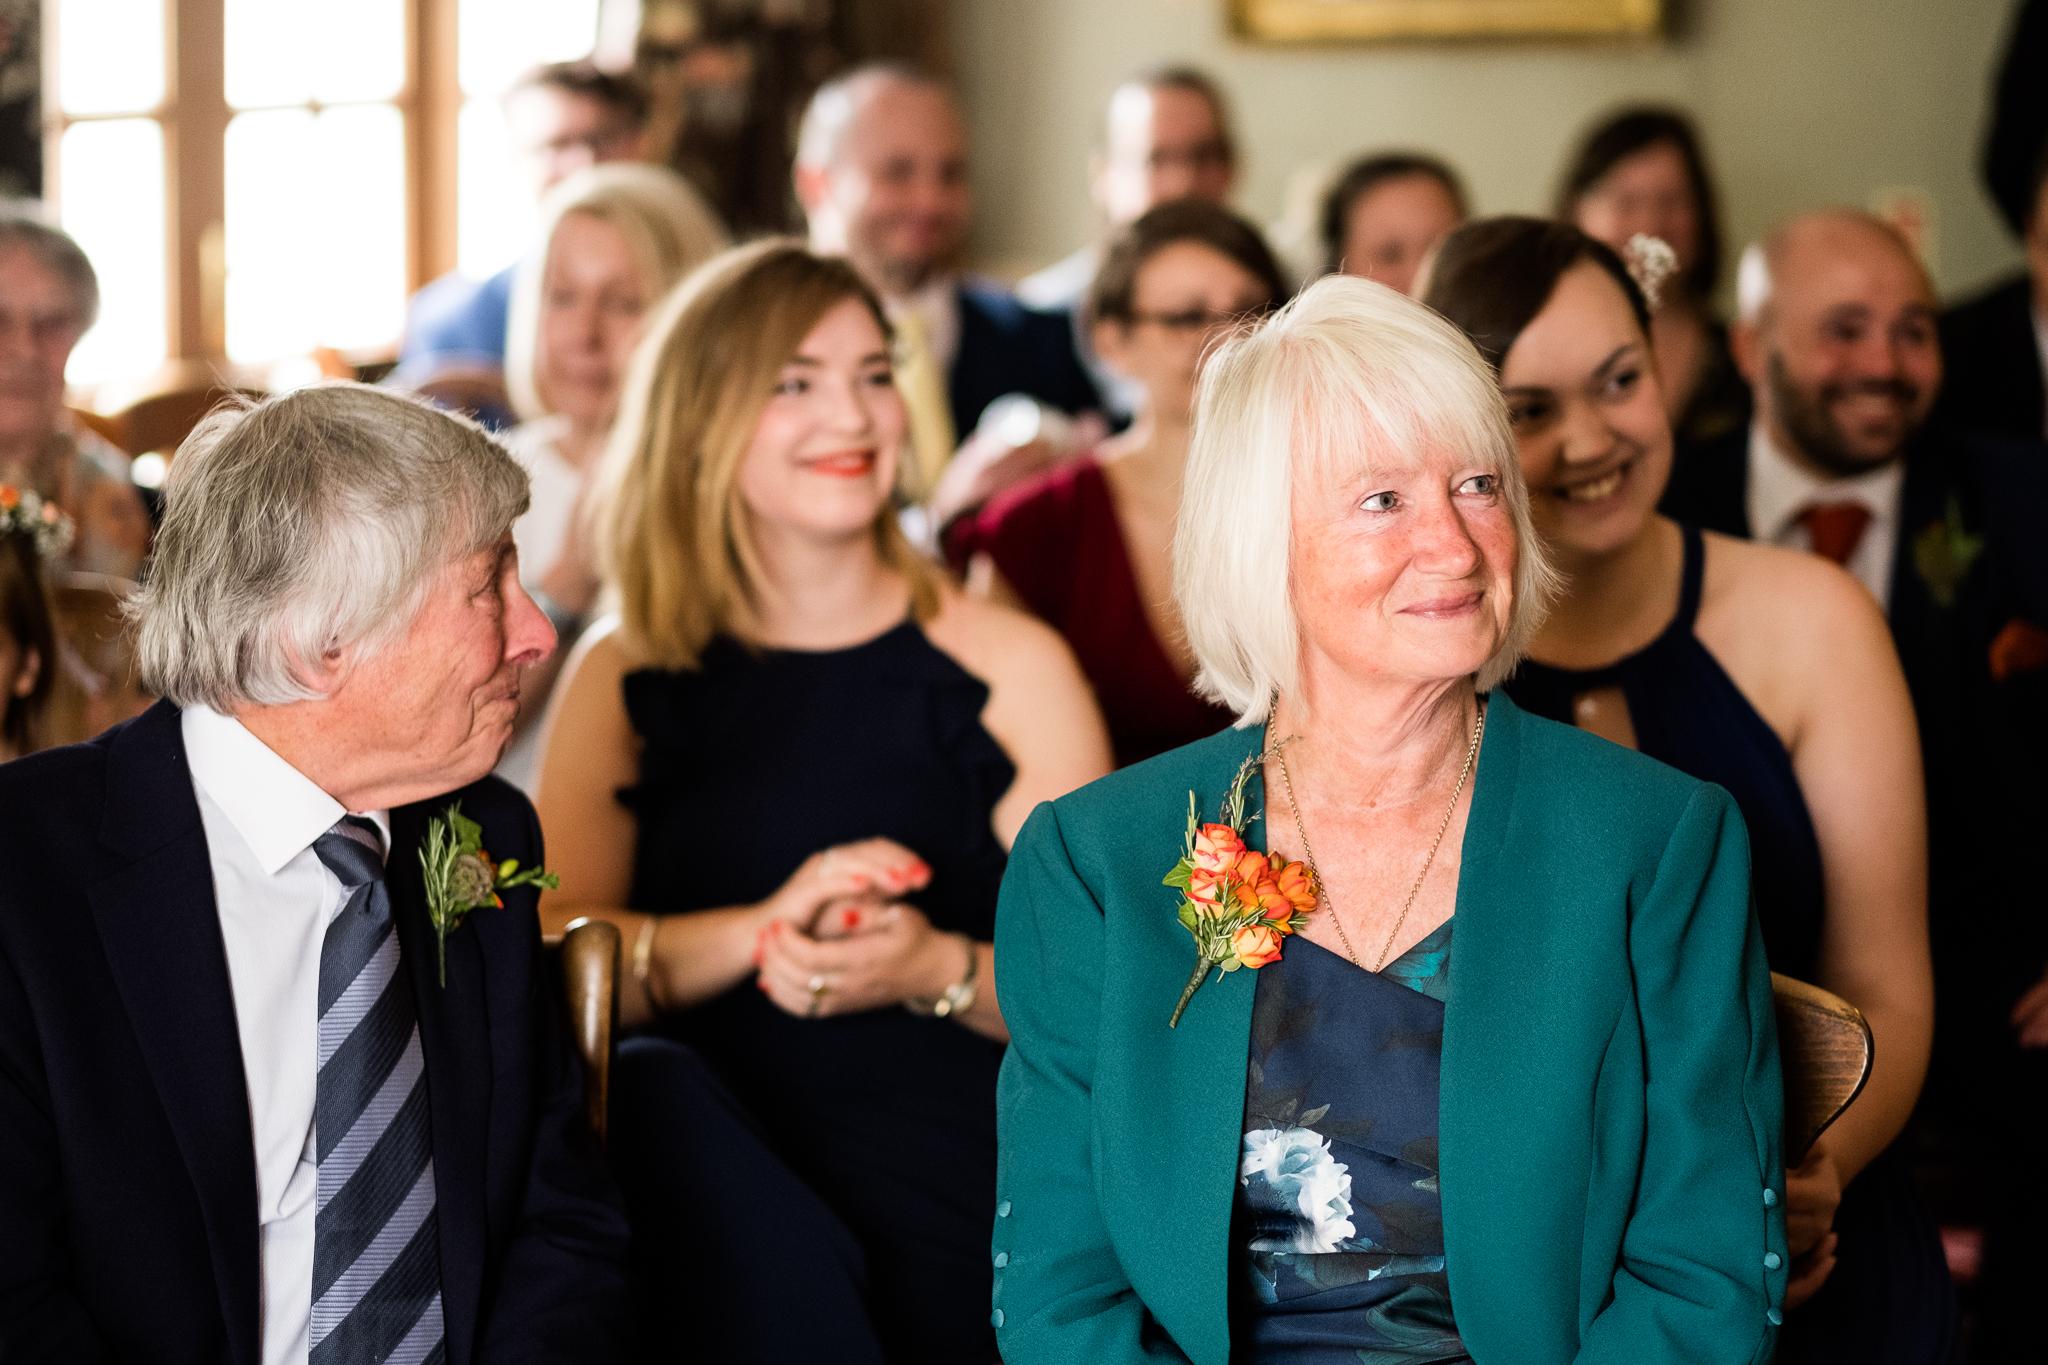 Relaxed Documentary Wedding Photography at The Wizard Inn, Alderley Edge Cheshire - Jenny Harper-23.jpg